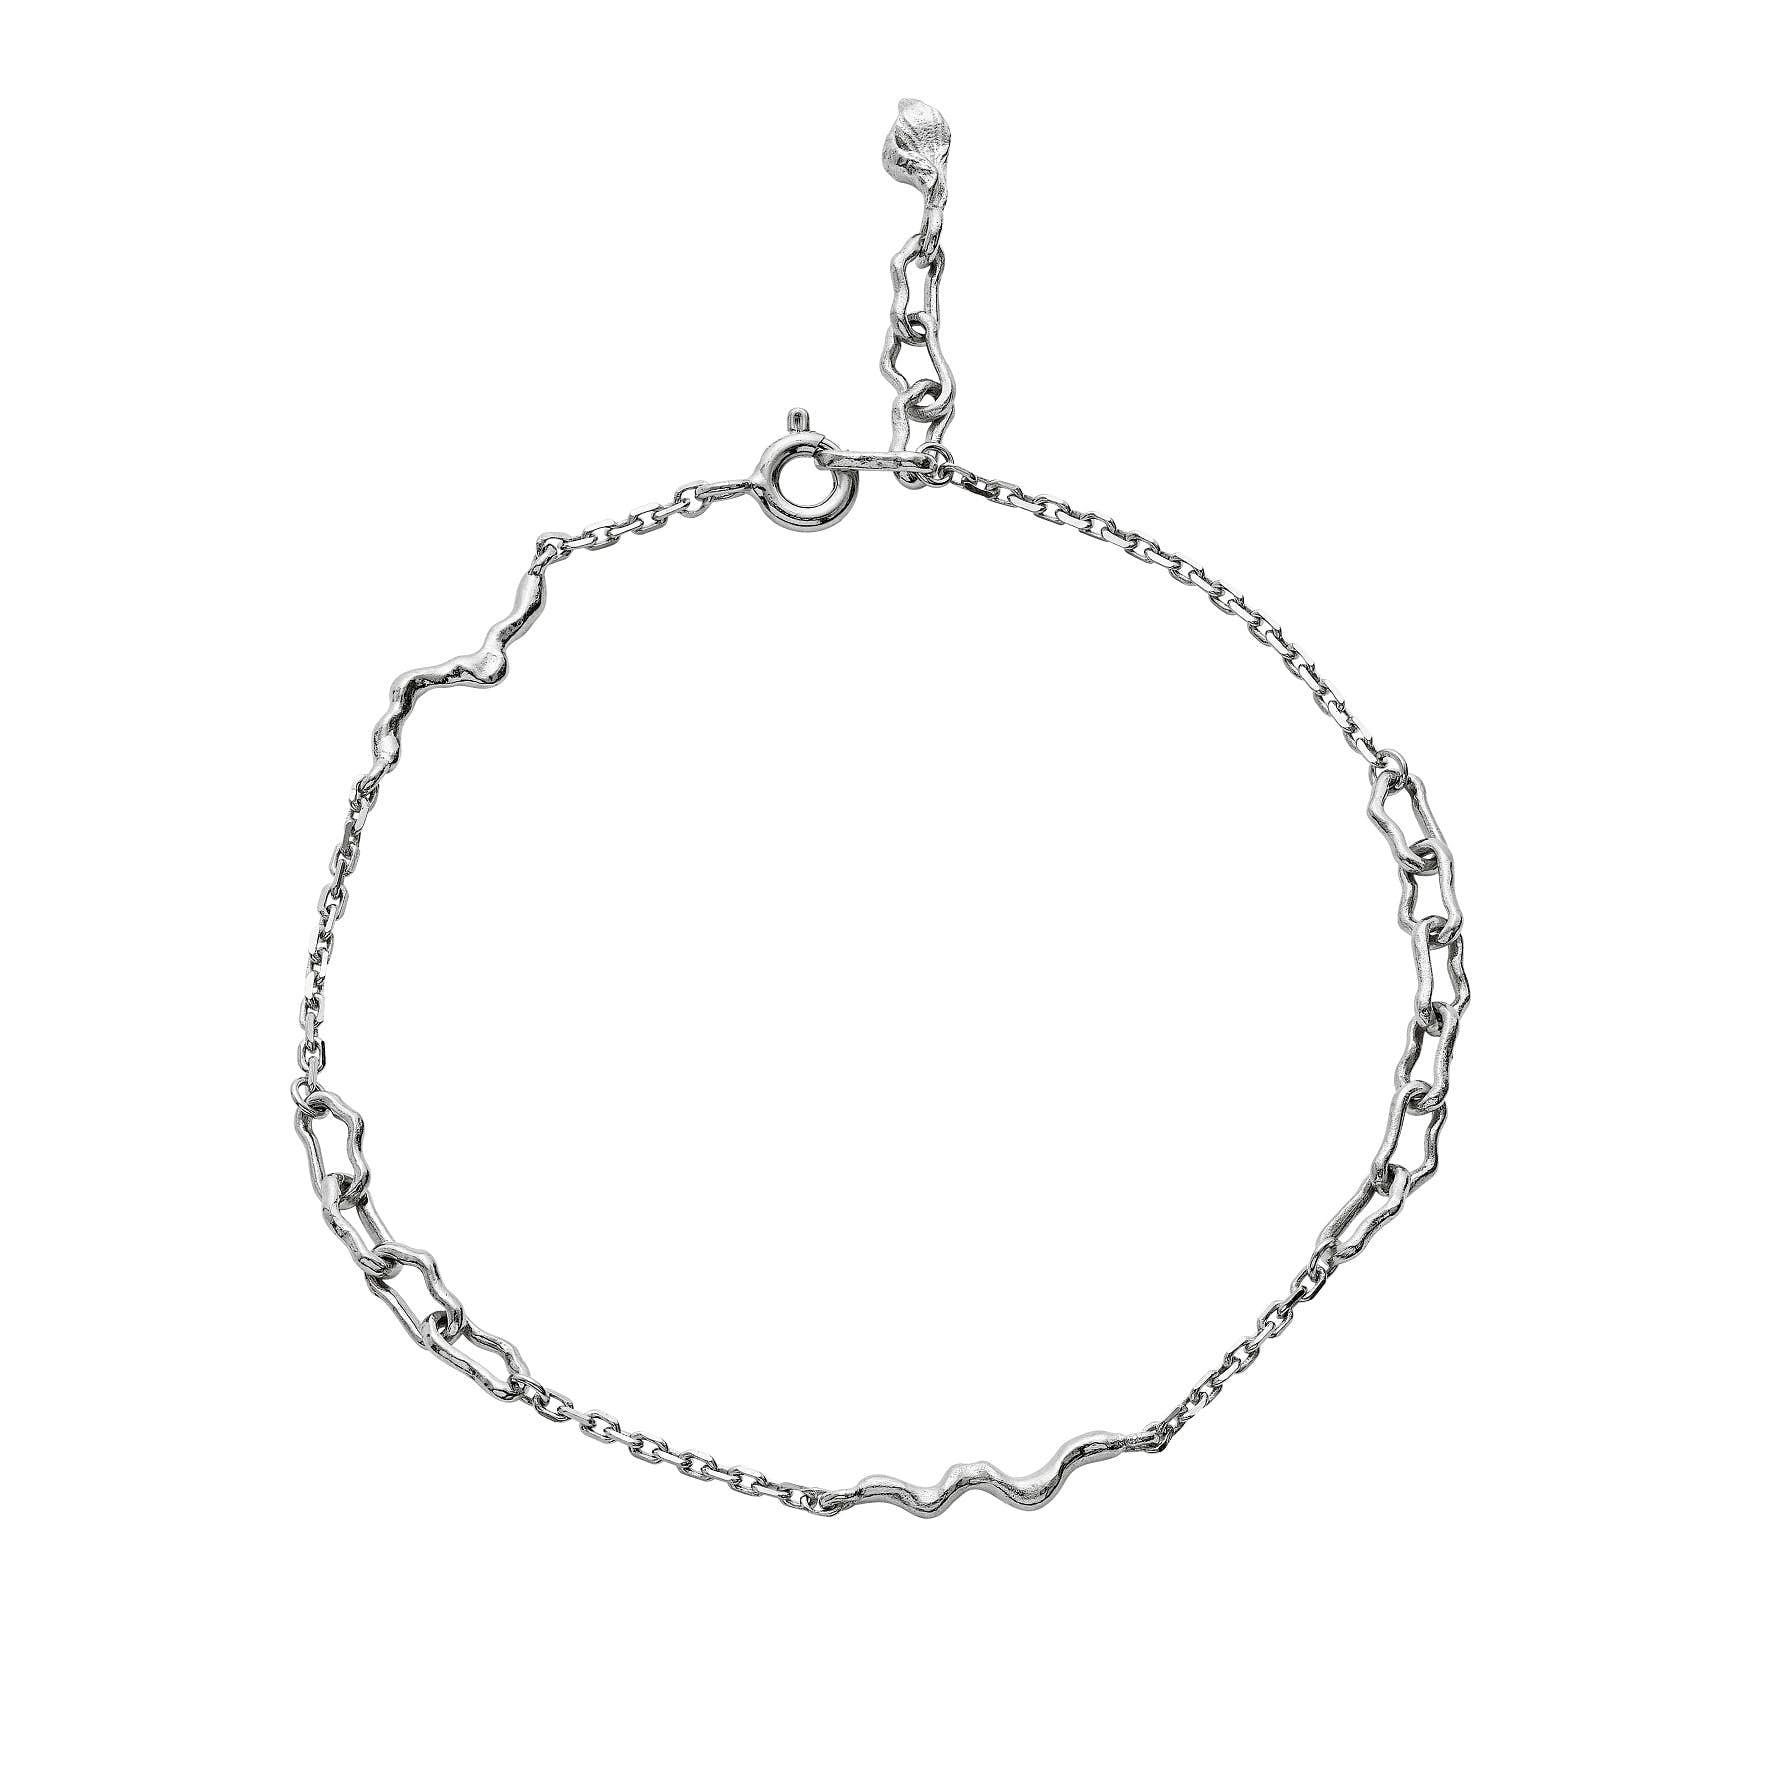 Lenani Bracelet från Maanesten i Silver Sterling 925